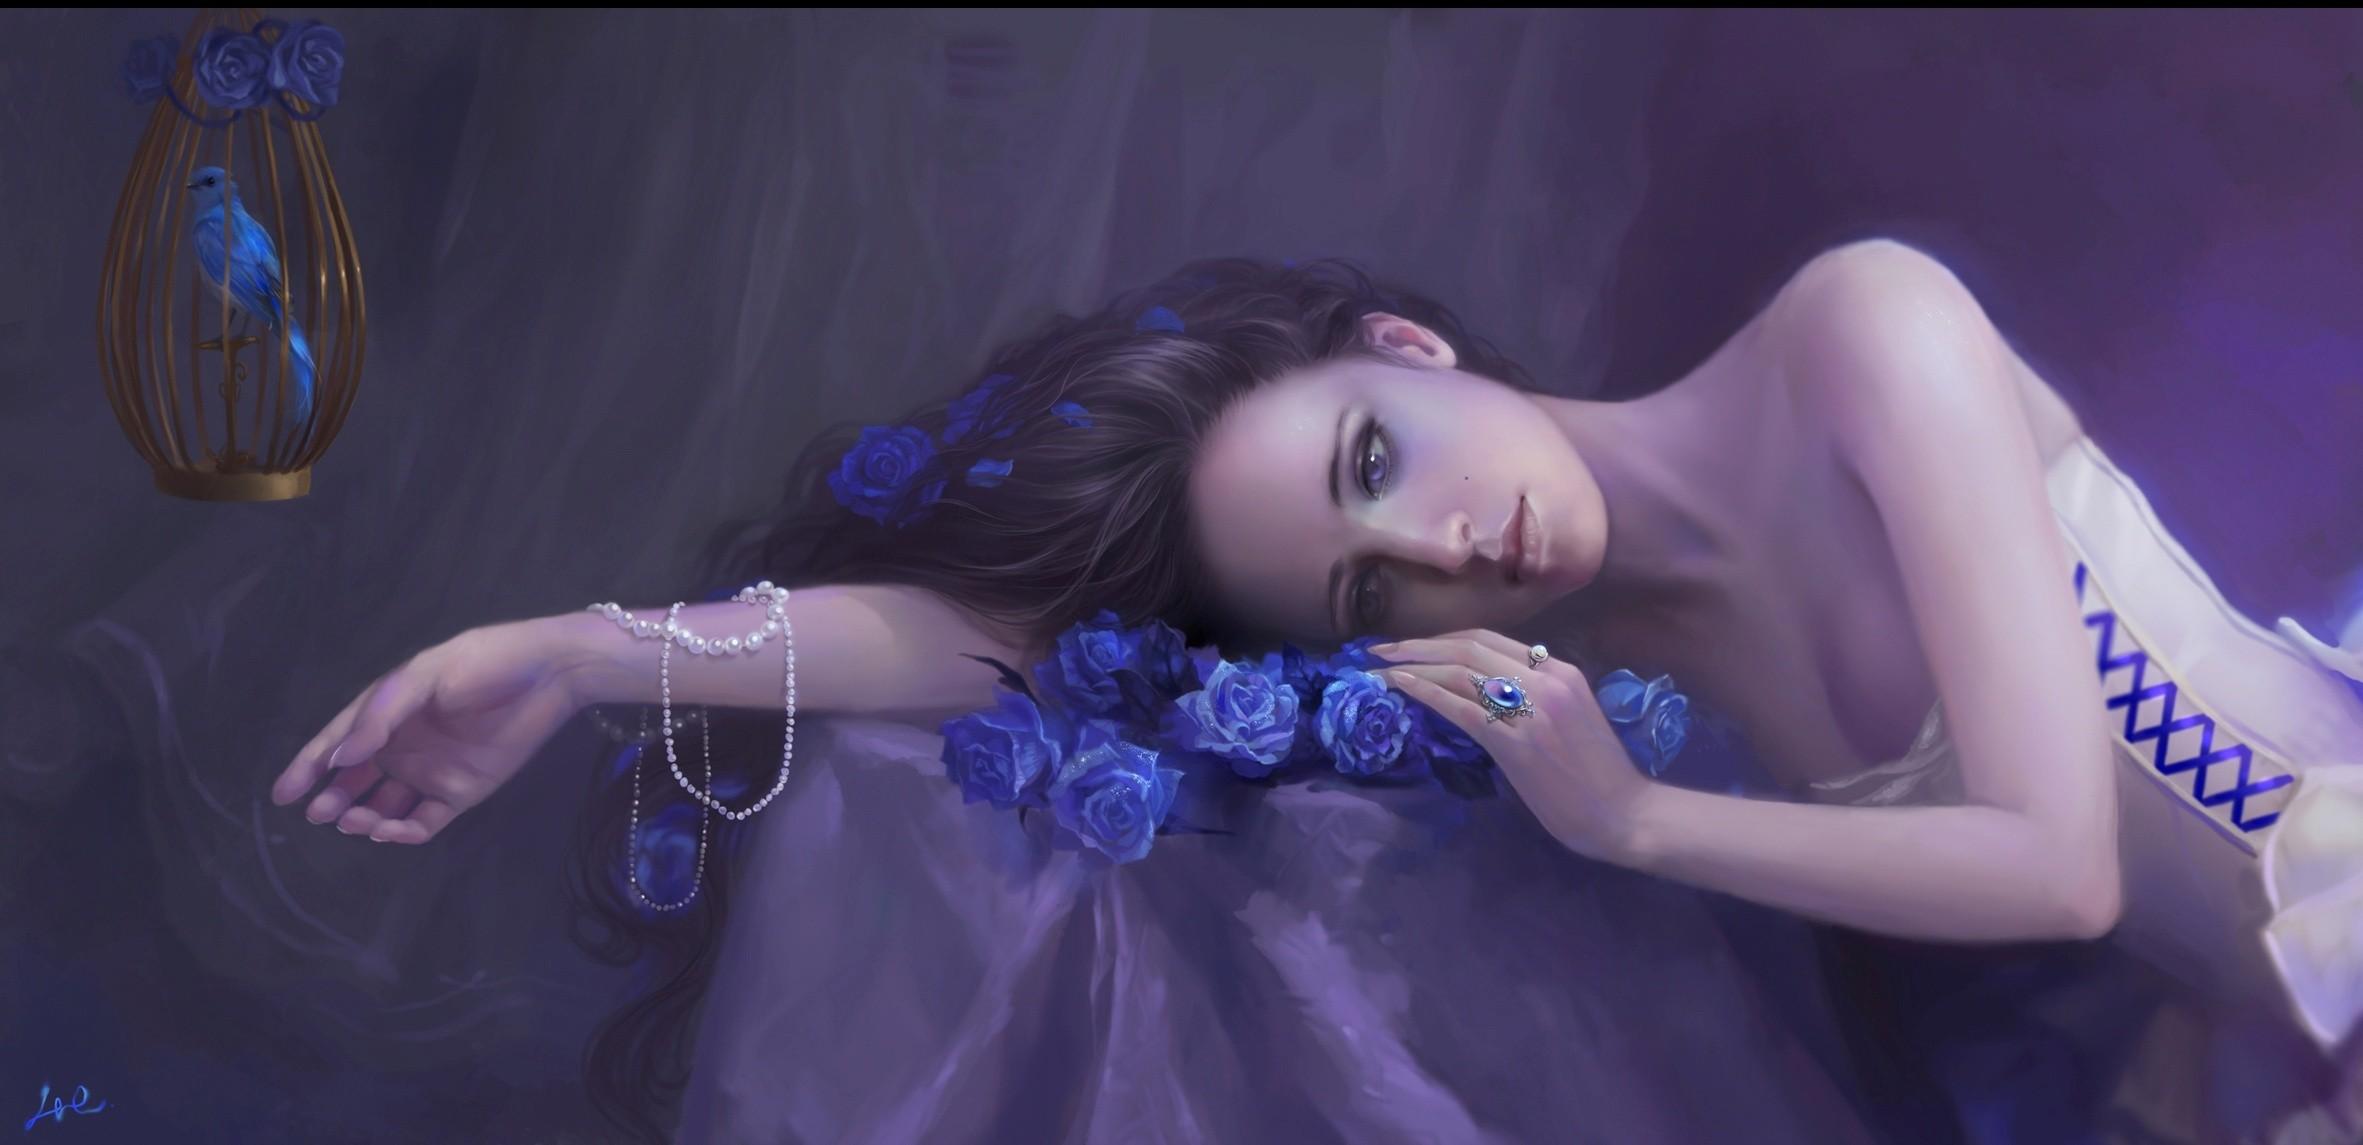 Lijiu girl flowers roses cage bird beads gothic mood girls women wallpaper  | | 91221 | WallpaperUP